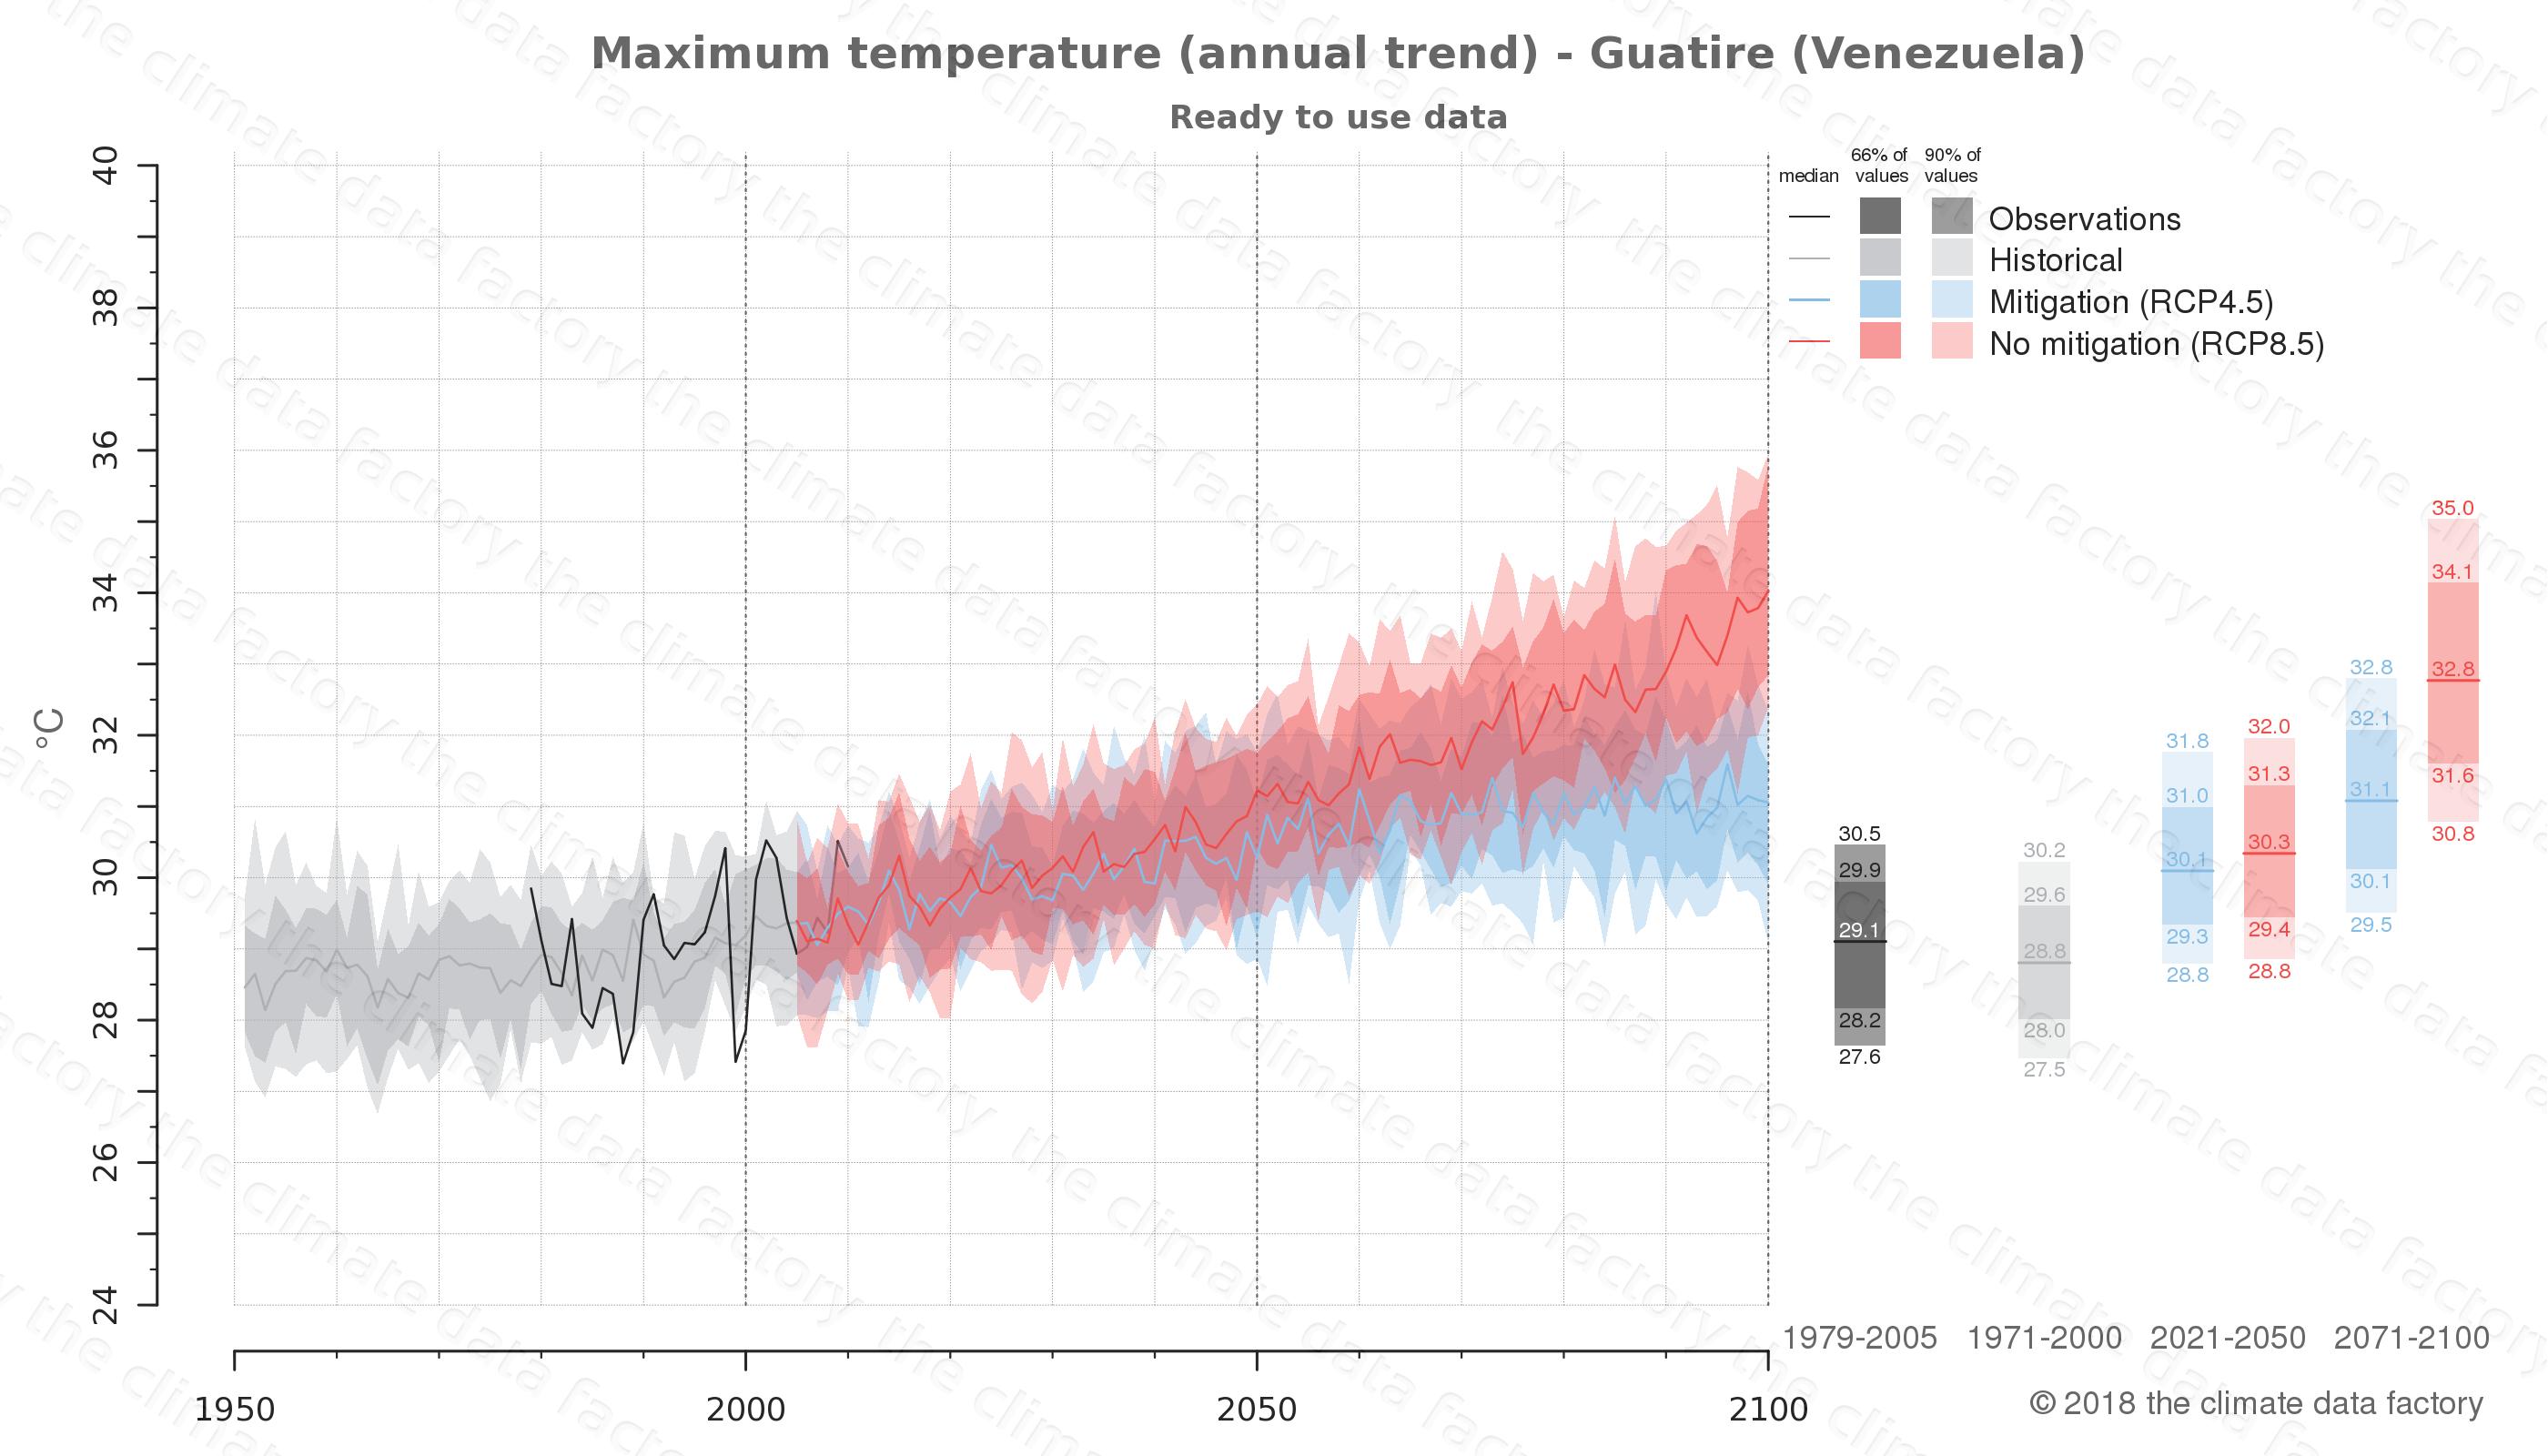 climate change data policy adaptation climate graph city data maximum-temperature guatire venezuela